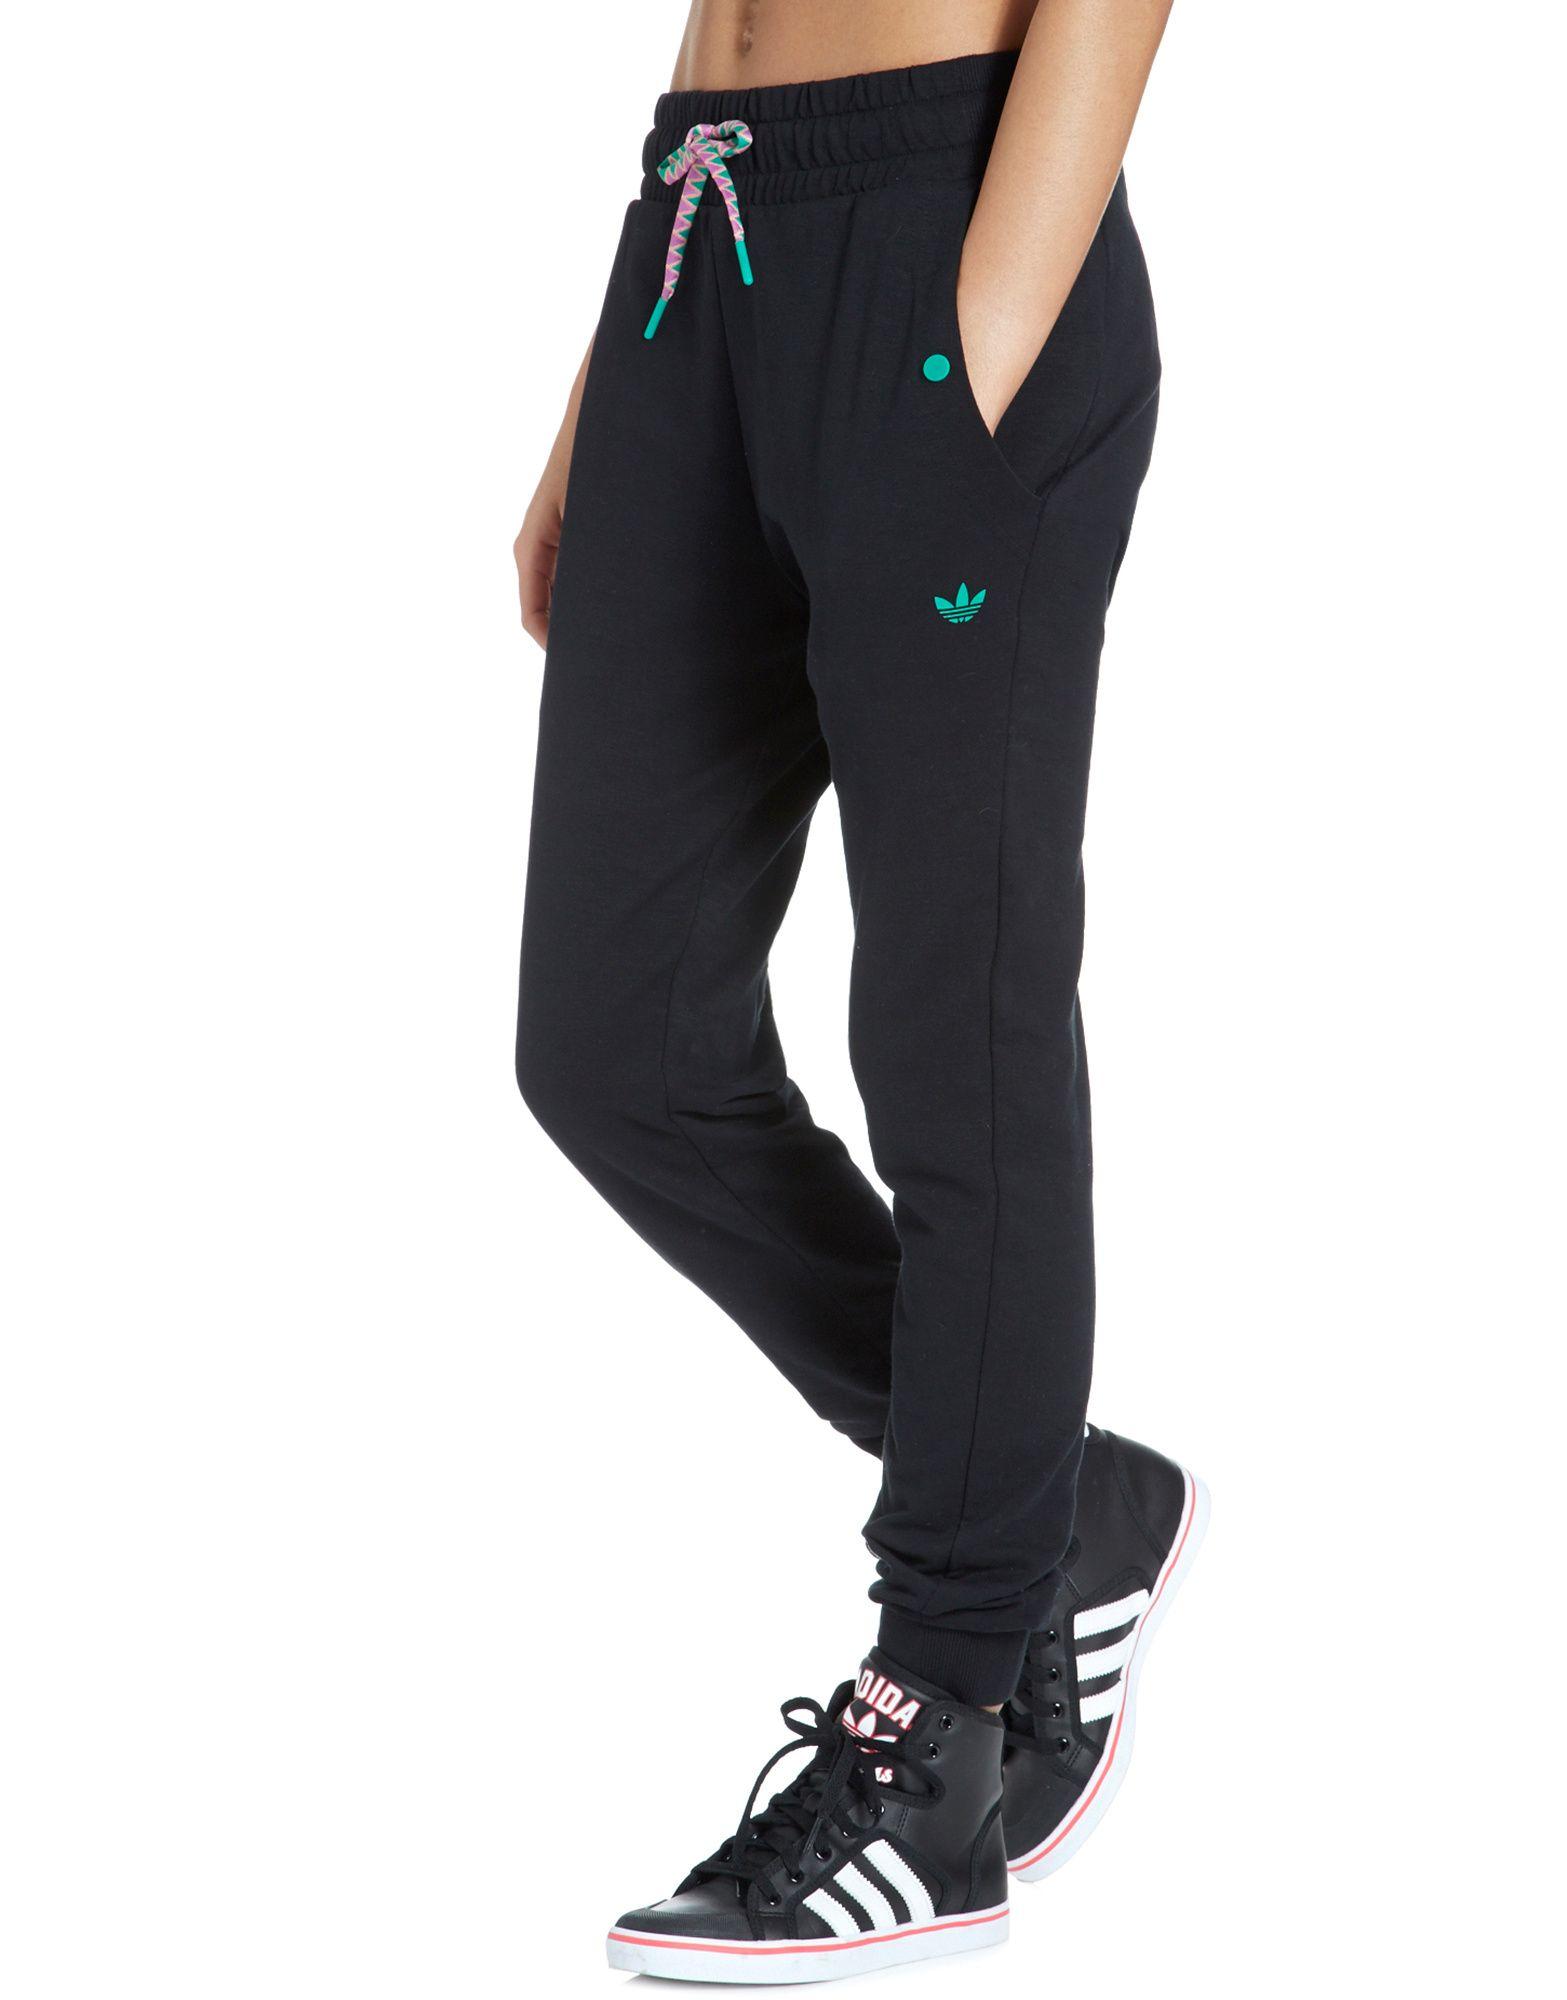 adidas Originals Native Jogging Bottoms